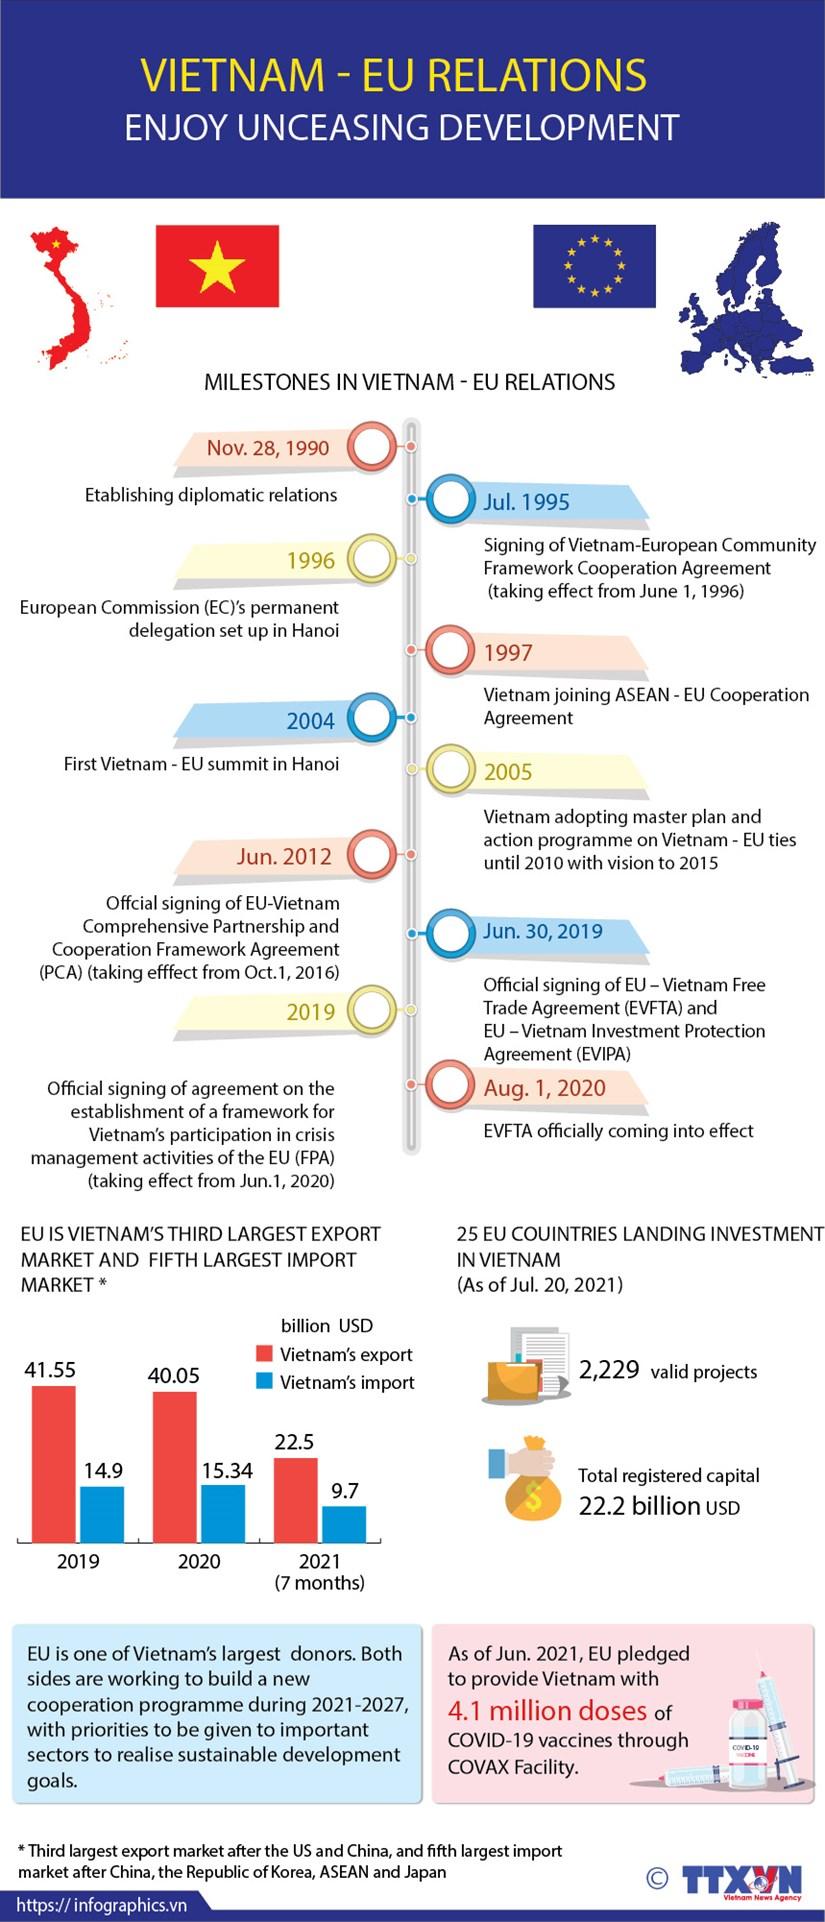 Vietnam - EU relations enjoy unceasing development hinh anh 1